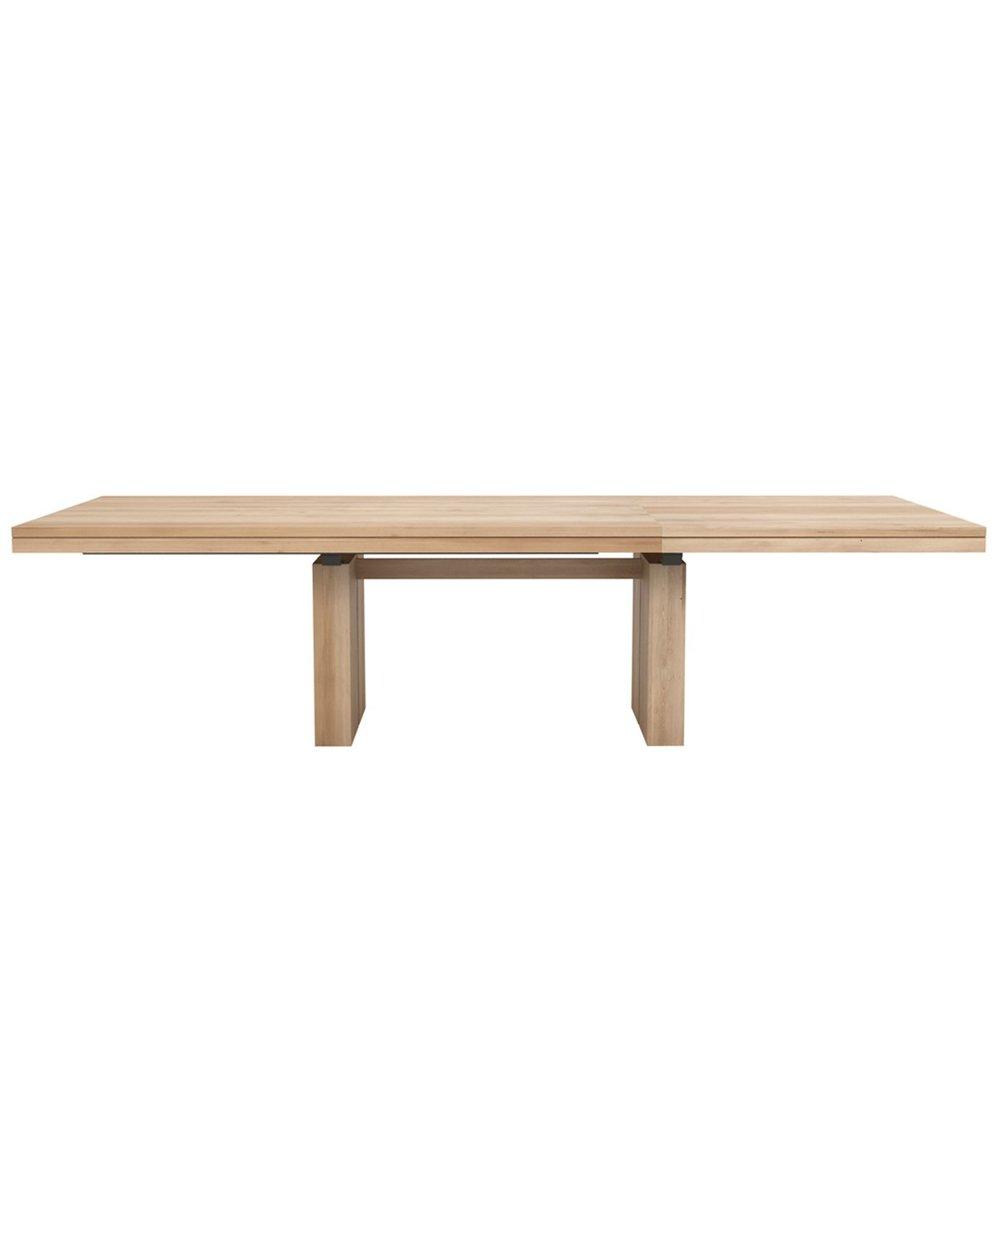 Antoni_Dining_Table_1.jpg